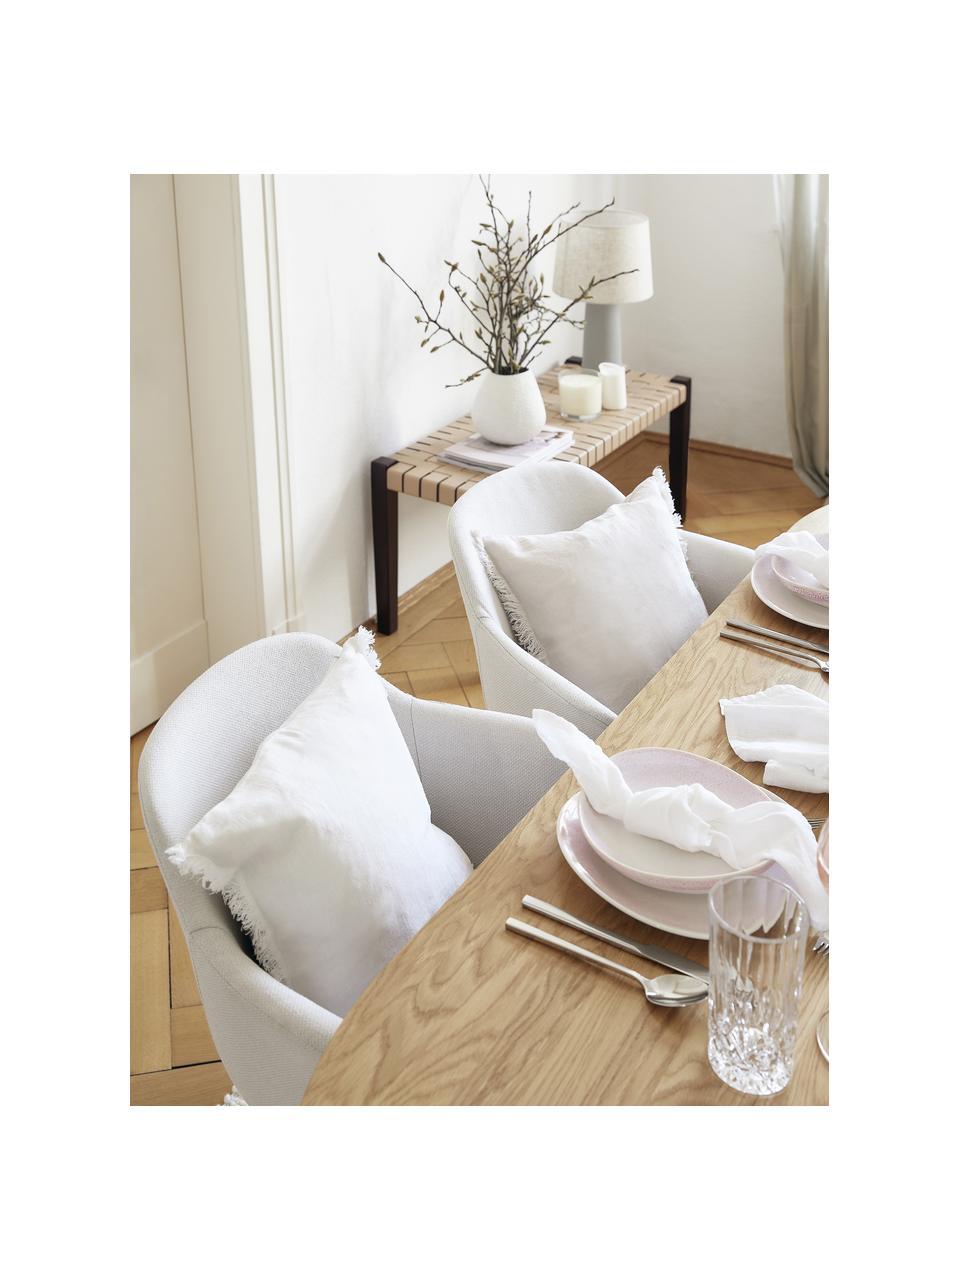 Federa arredo in lino bianco crema con frange Luana, 100% lino, Bianco crema, Larg. 60 x Lung. 60 cm